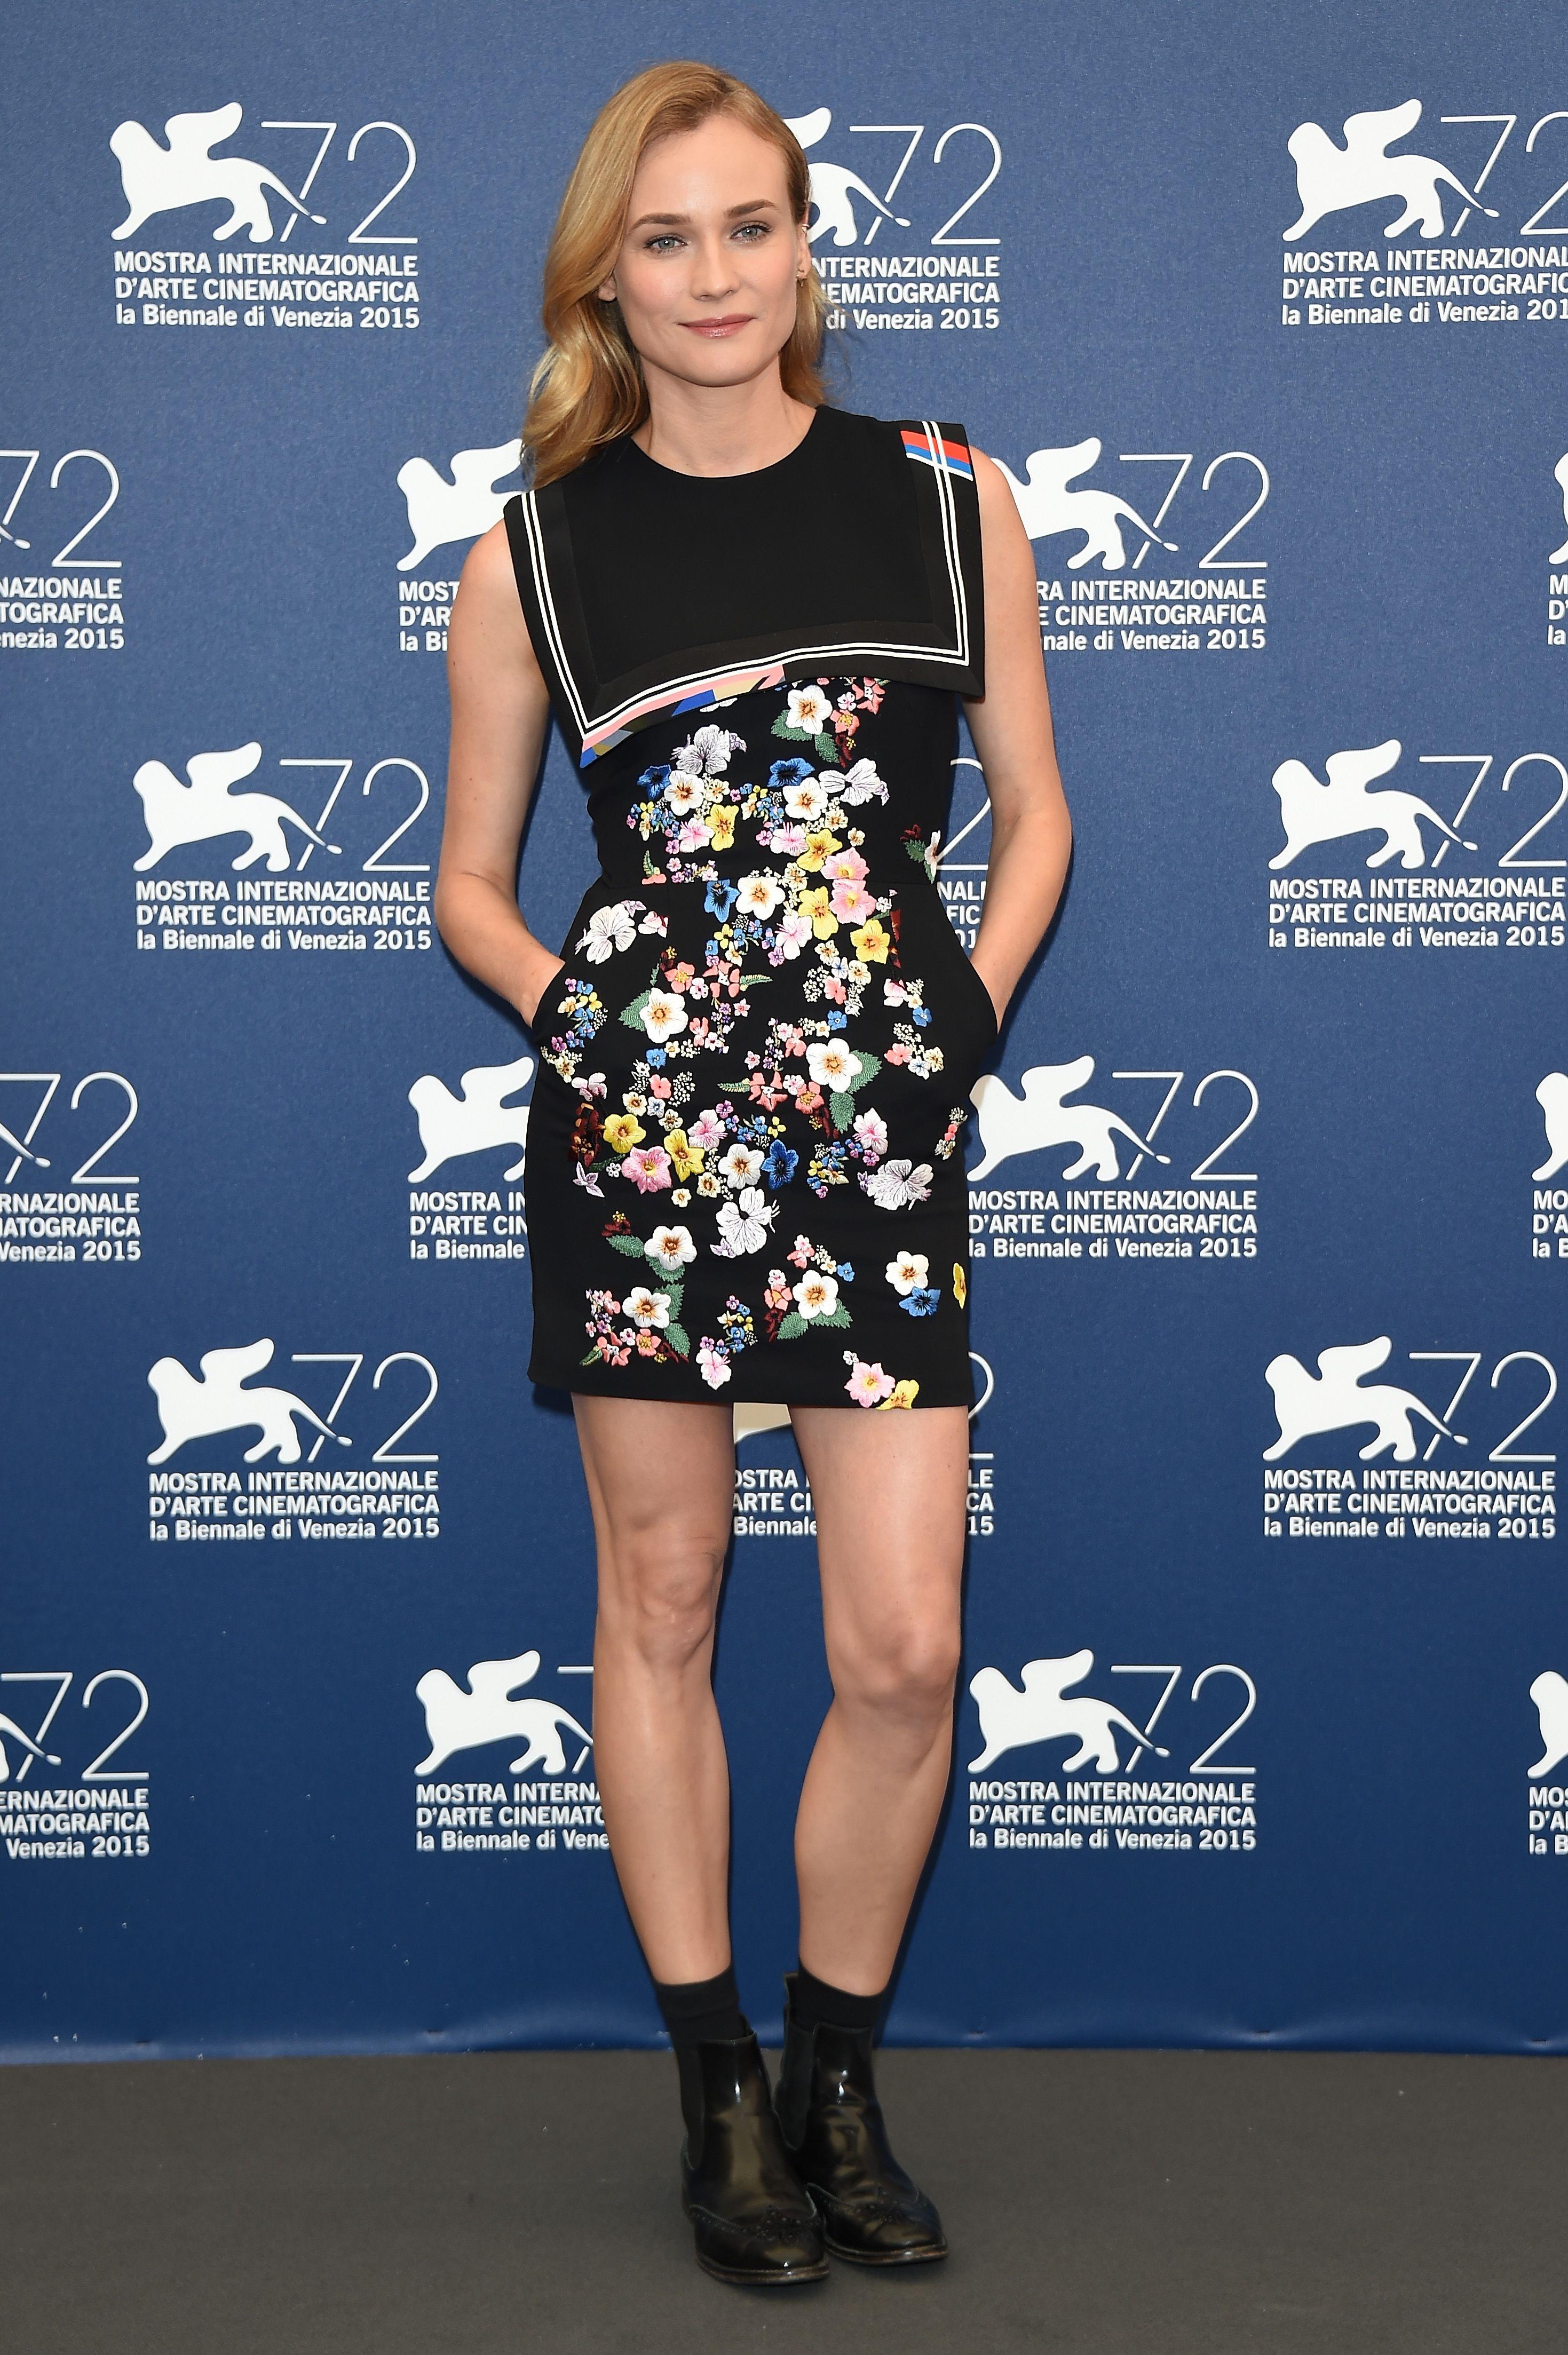 a643fbb6904a Diane Kruger at Venice Film Festival 2015